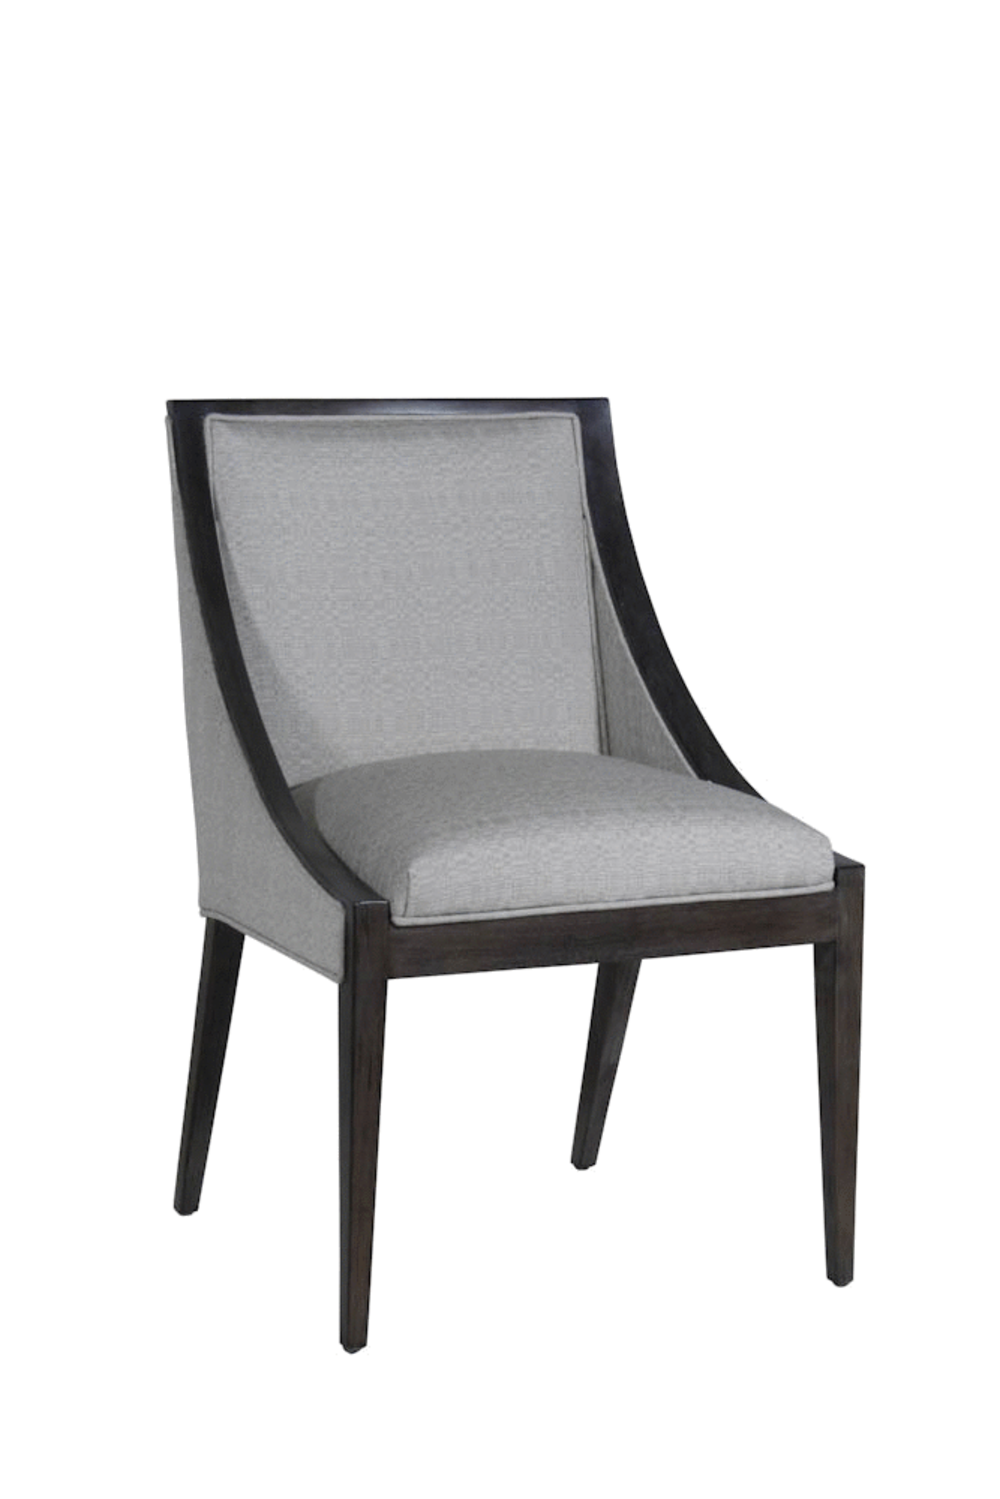 Cox Manufacturing - Hostess Chair